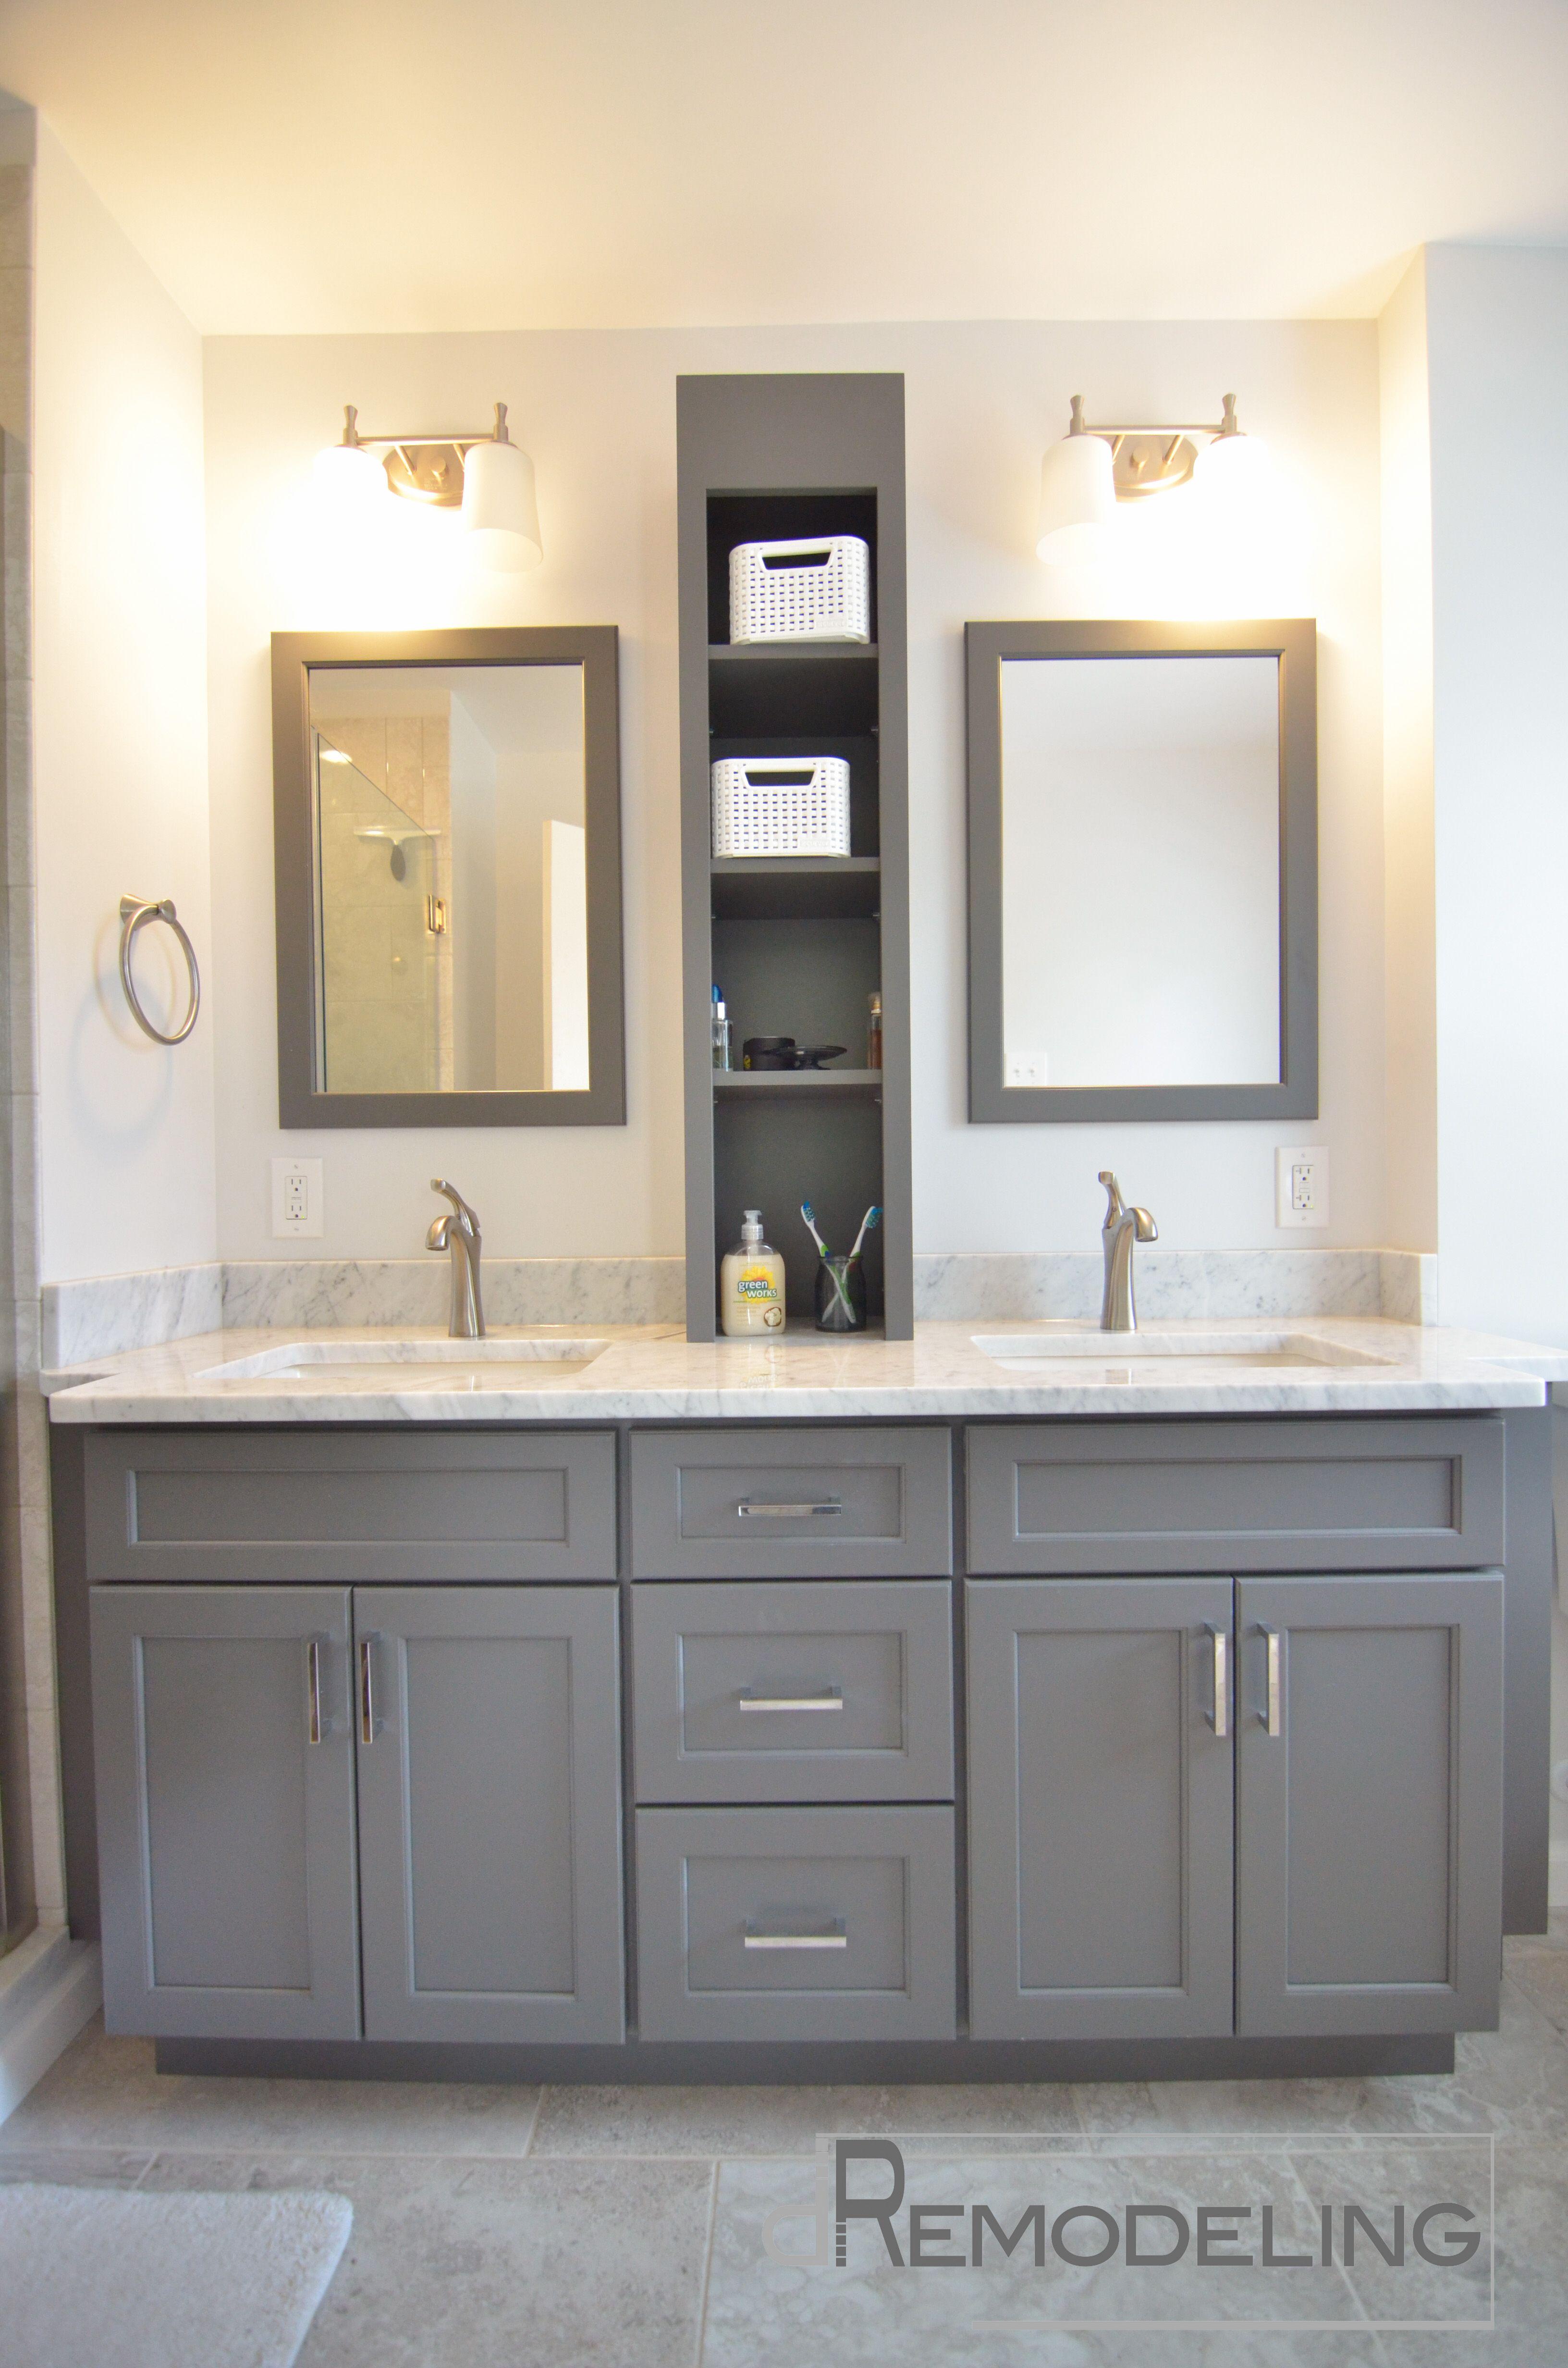 hampton style bathrooms google search small space bathroom design small space bathroom bathroom remodel master